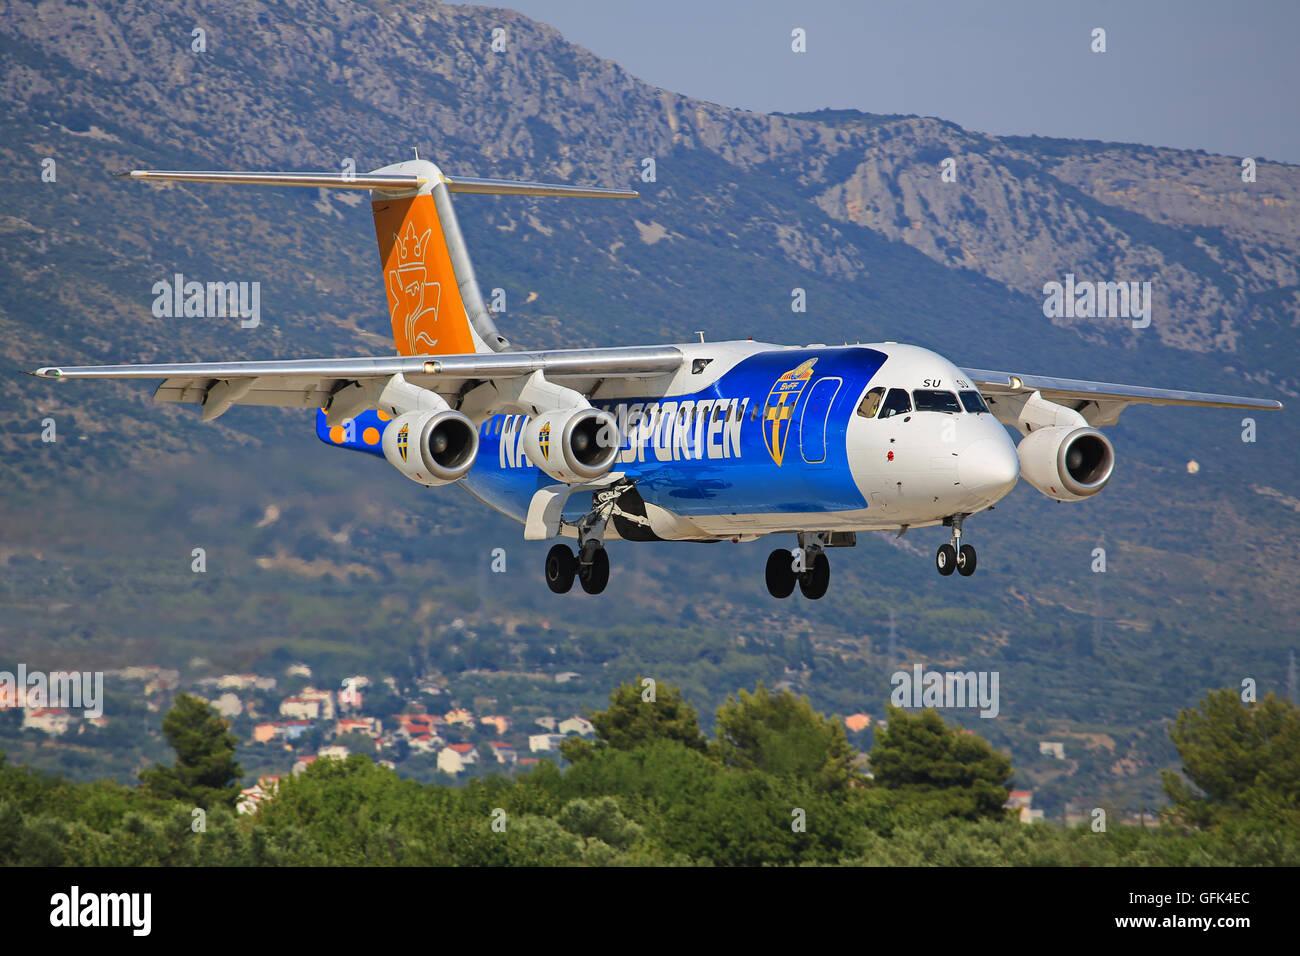 Split/Kroatia July 12, 2015: Malmo Aviation British Aerospace Avro 146-RJ100 on short finals at Splt - Stock Image